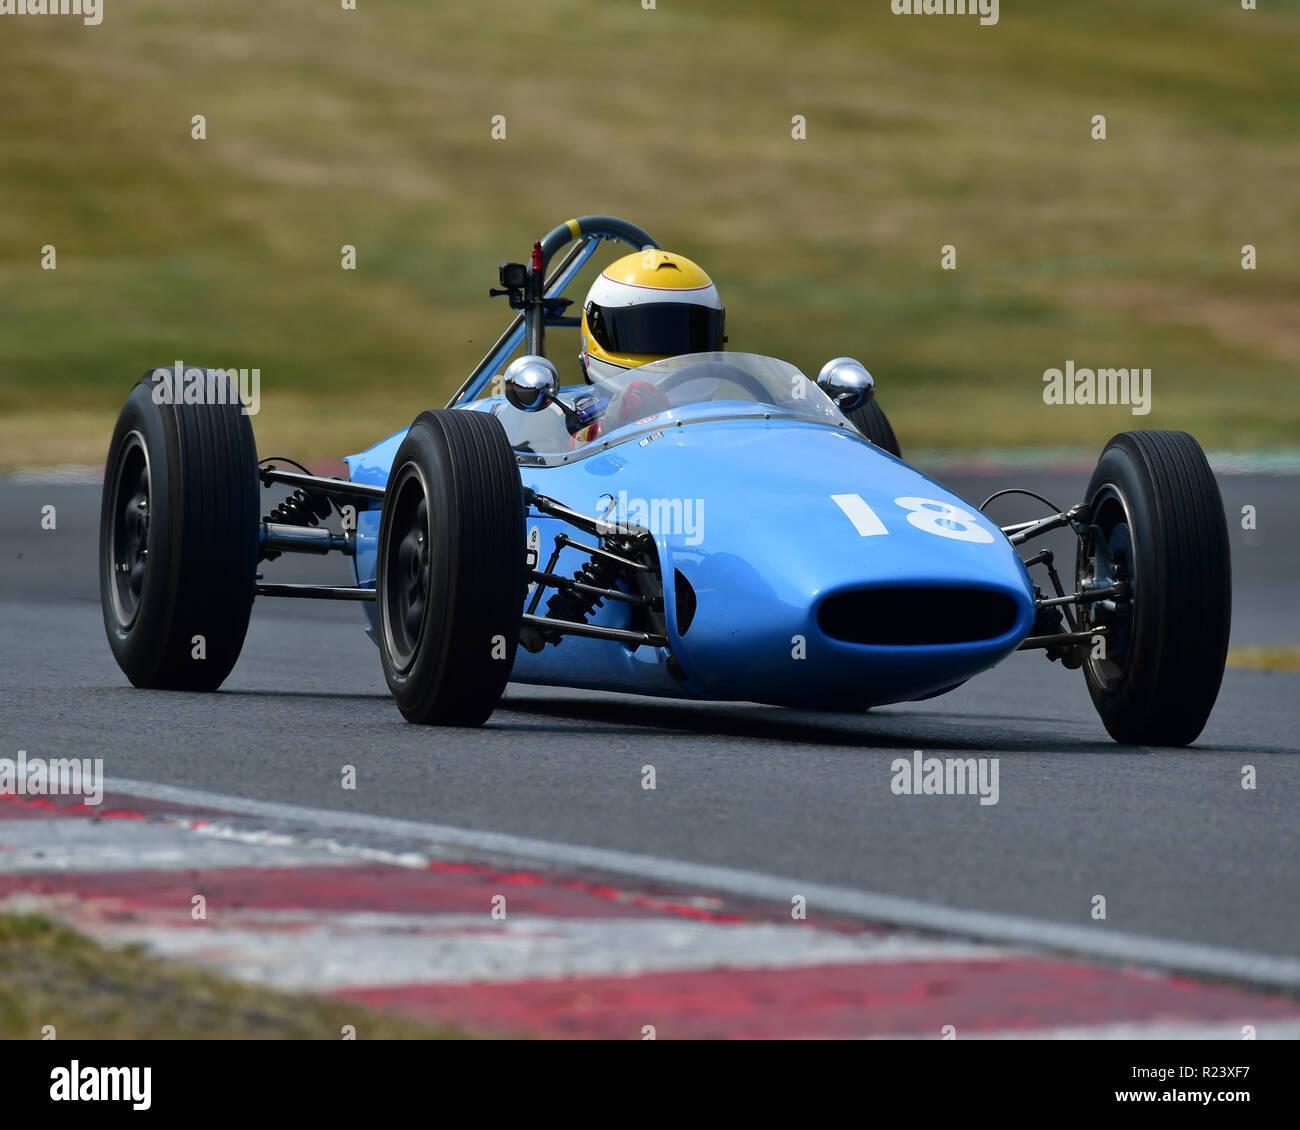 Philippe Bonny, Brabham BT2, HGPCA Pre66, Historic Grand Prix Cars, HSCC Legends of Brands Hatch Super Prix, June - July 2018, 2018, Autosport, Brands - Stock Image